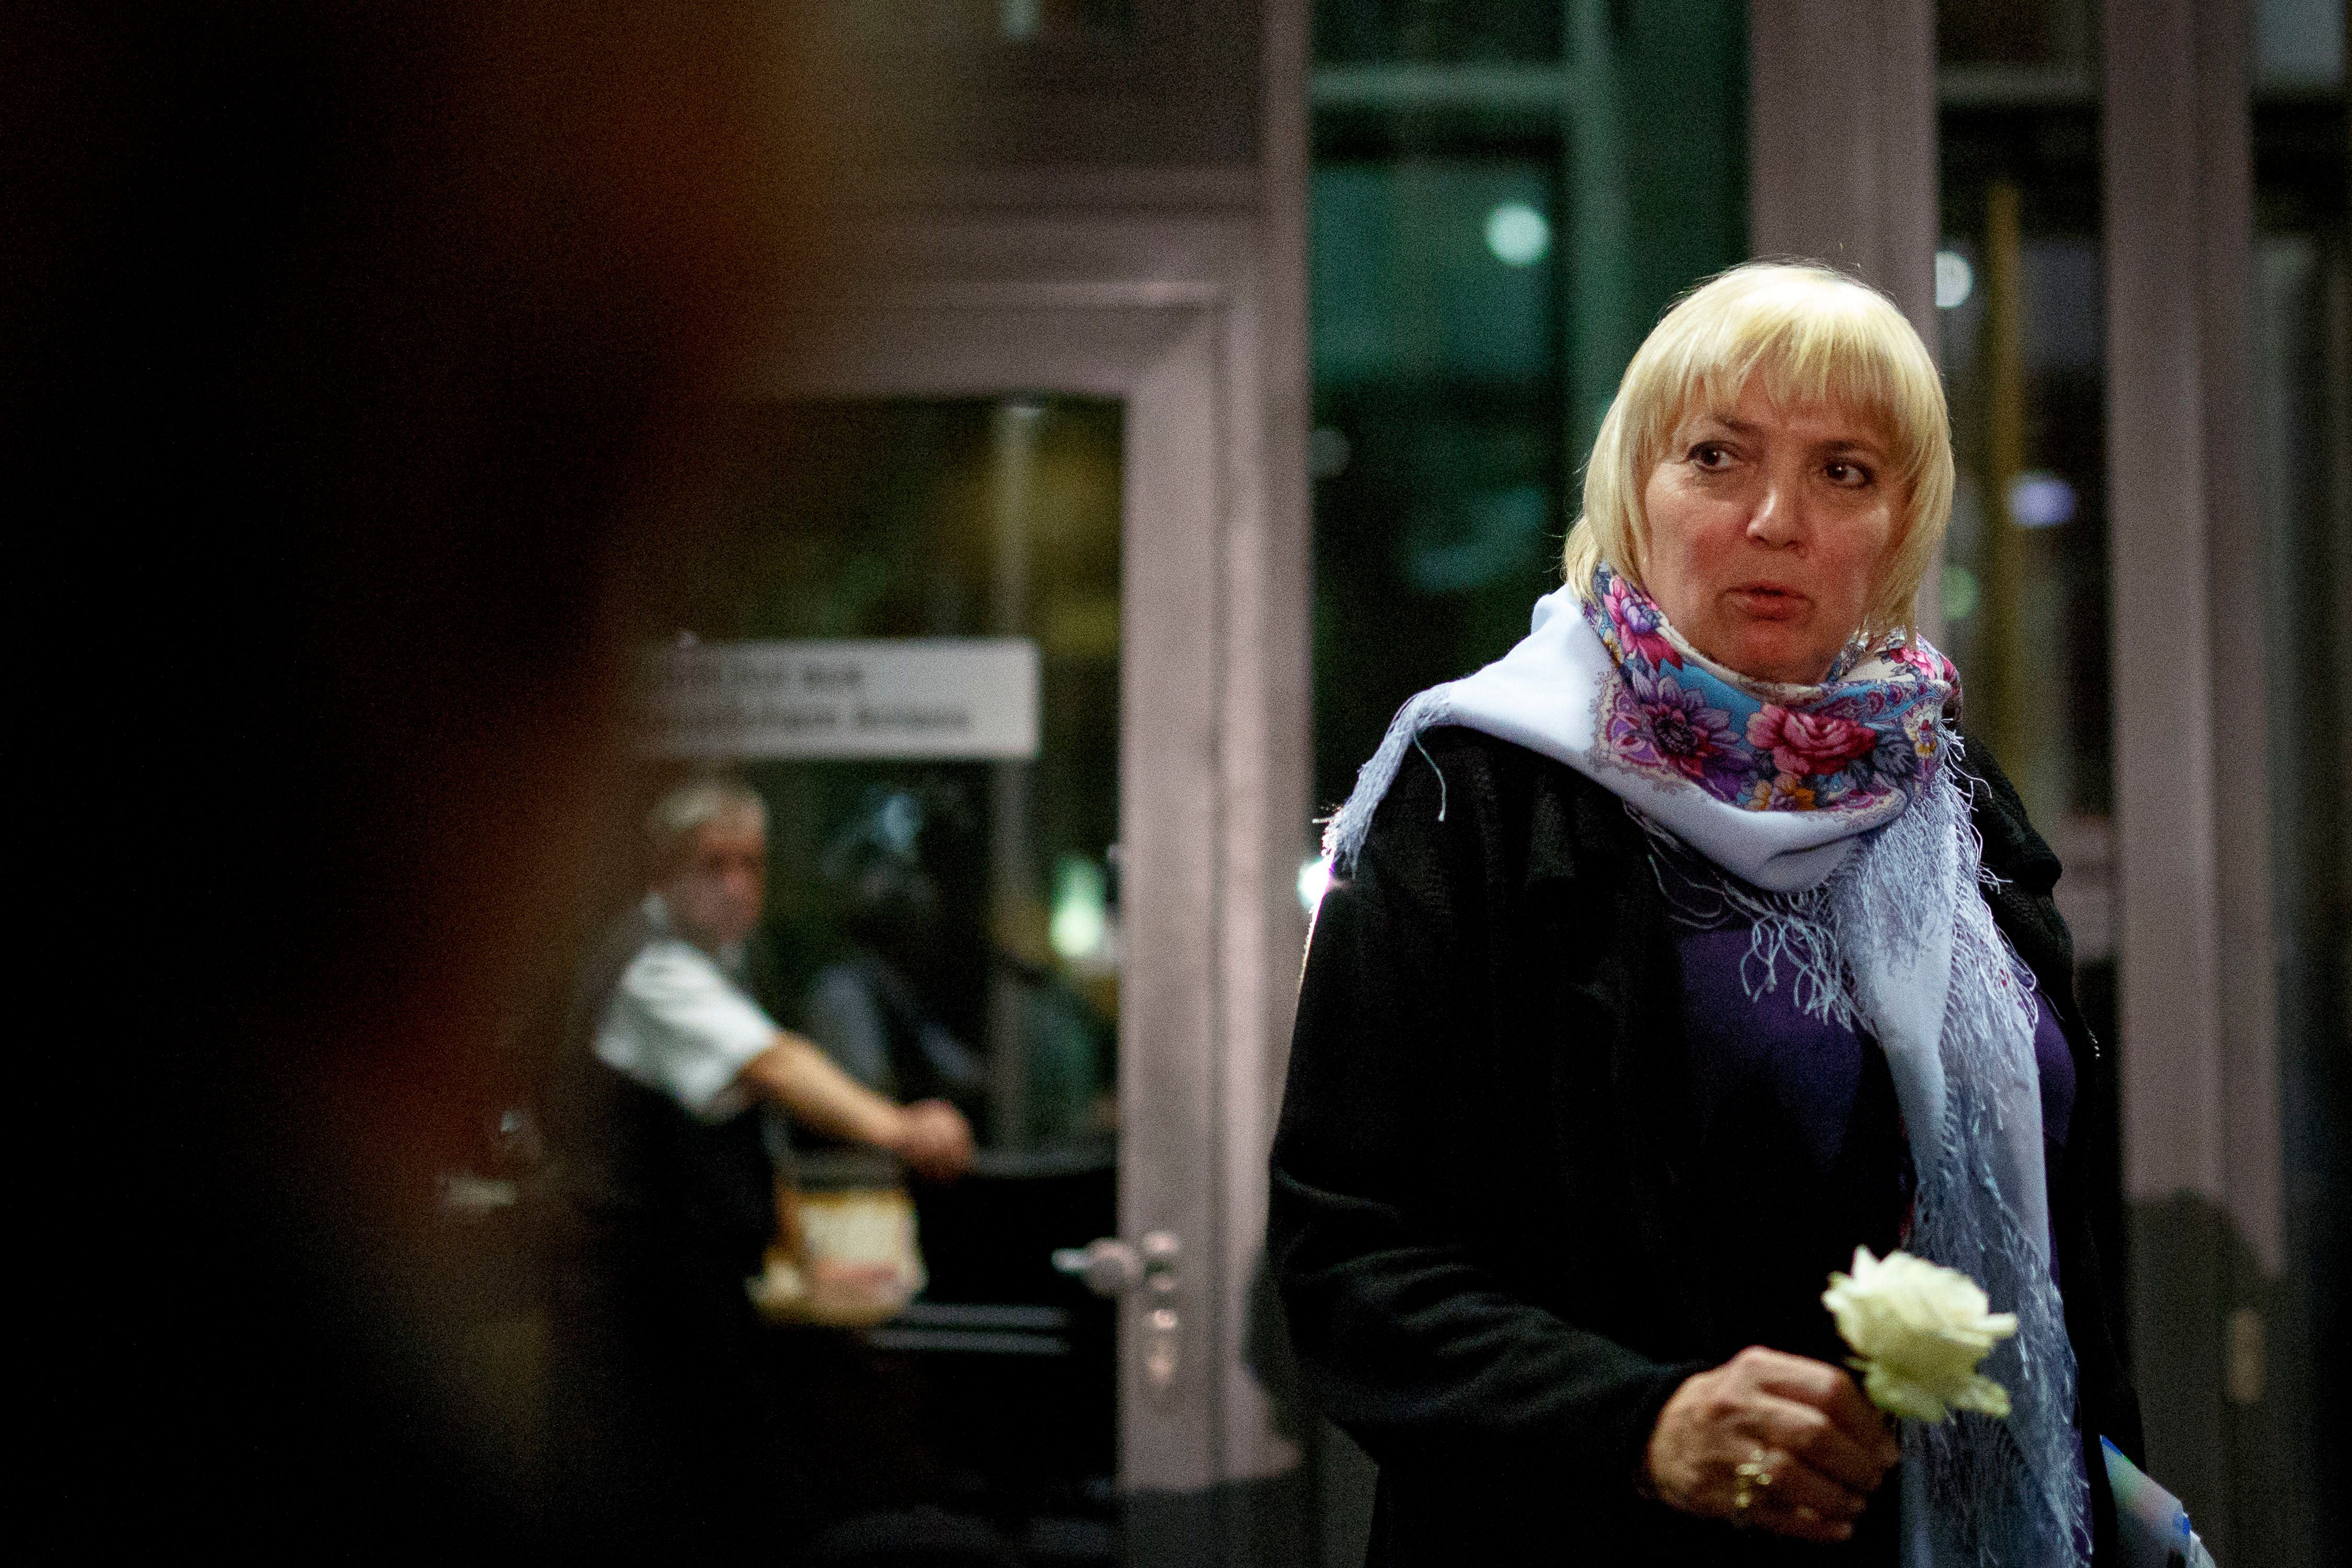 Claudia Roth über AfD im Bundestag: